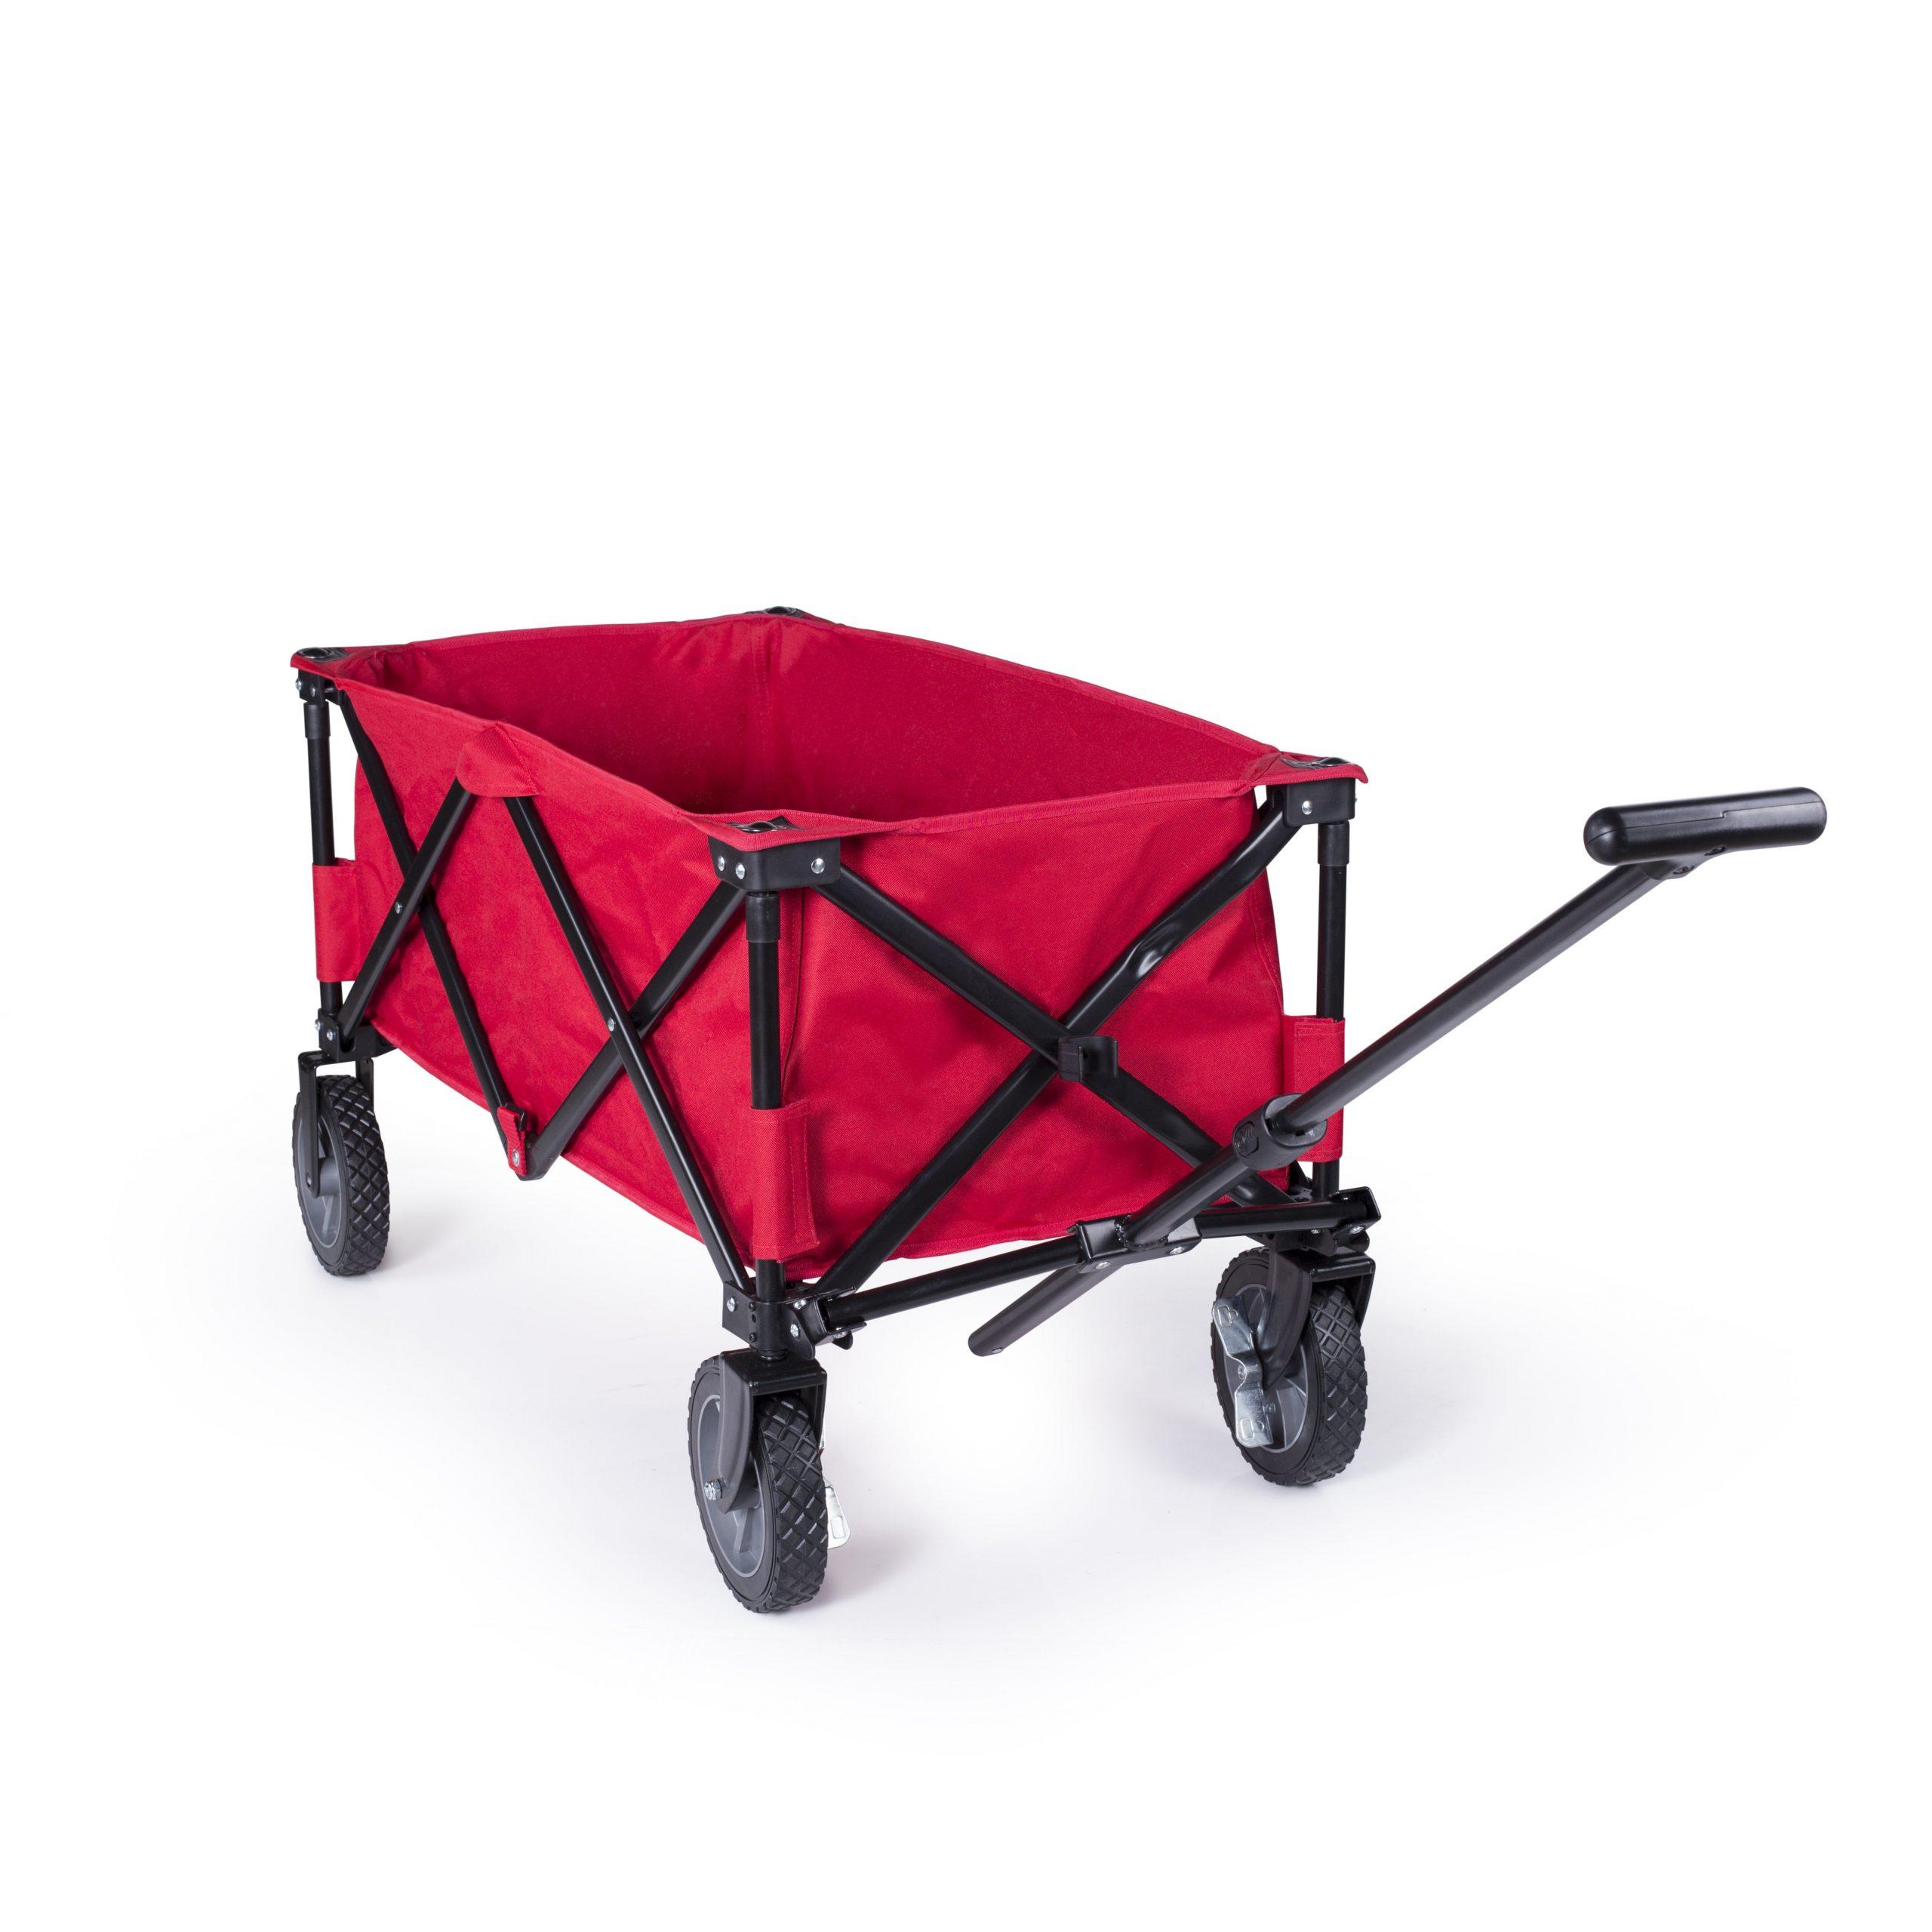 Chariot 4 Roues Campart, 100 L, 70 Kg encequiconcerne Chariot De Jardin Leroy Merlin